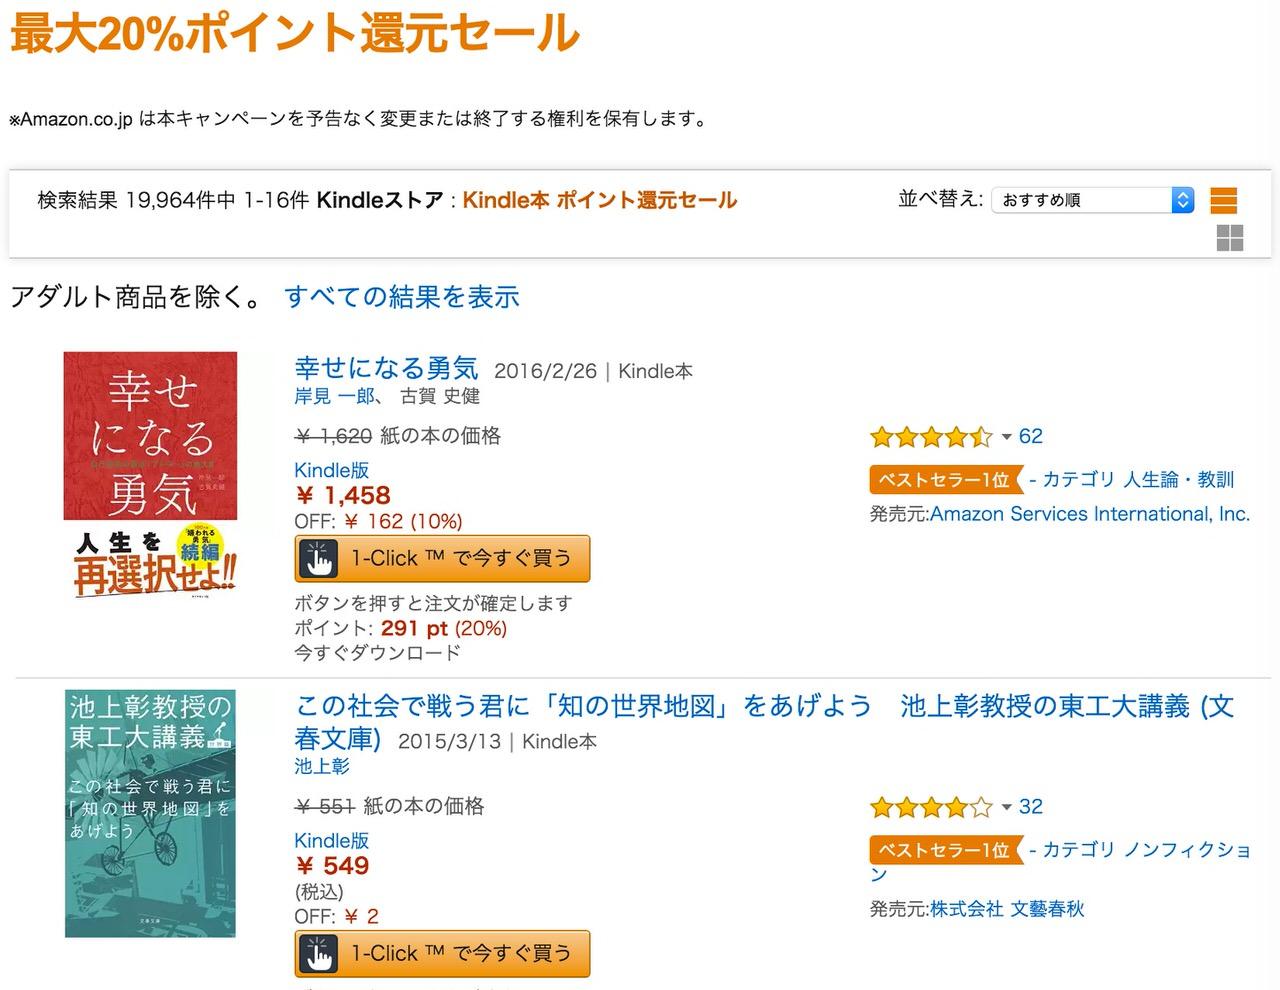 【Kindle】またもや大型セール!19,964冊が対象の「最大20%ポイント還元セール」を開始